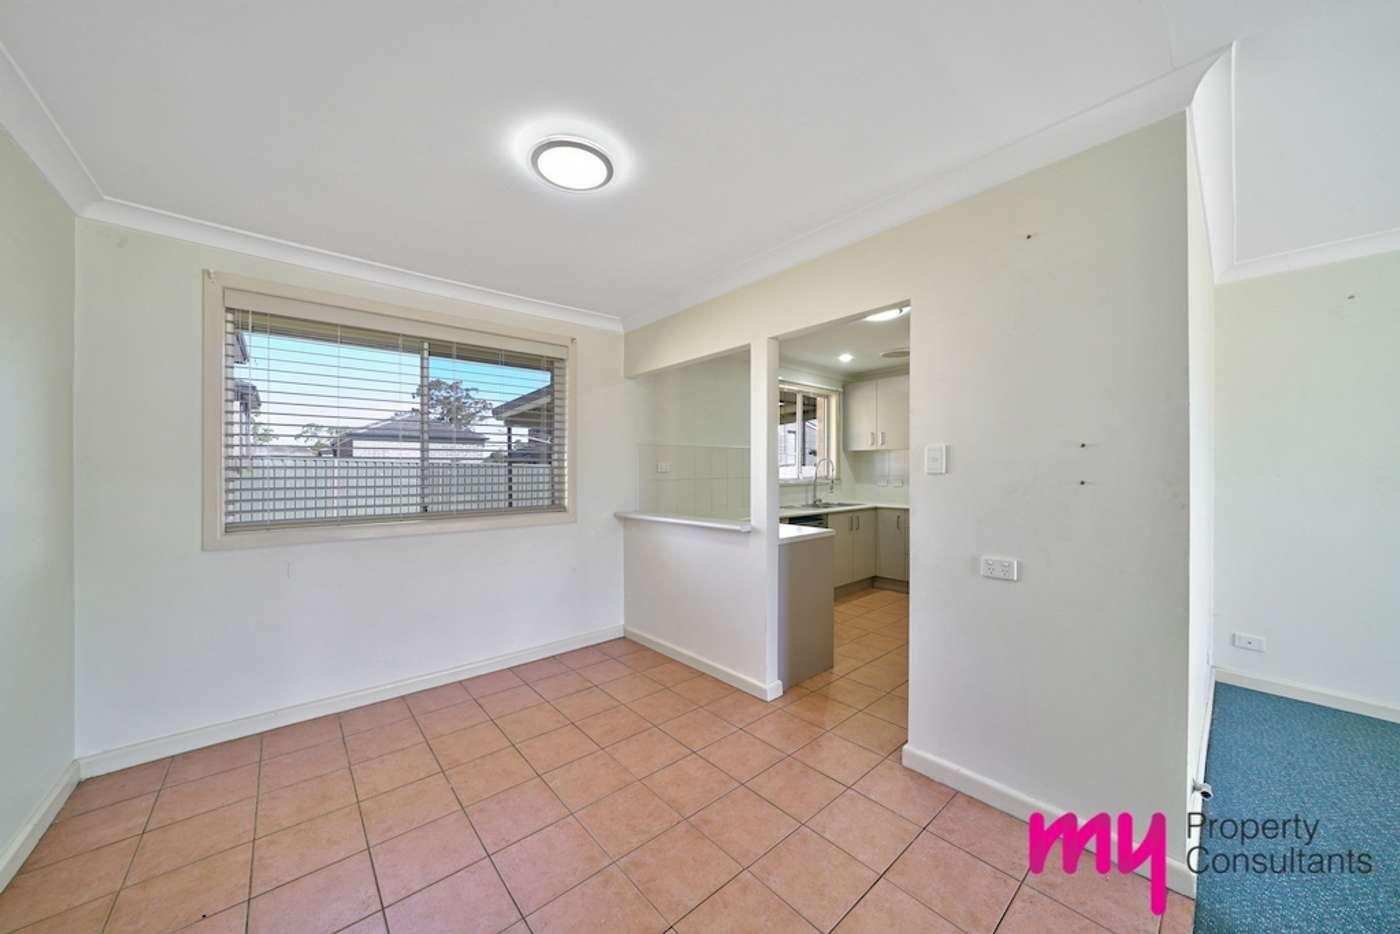 Fifth view of Homely house listing, 2 Bradbury Street, Tahmoor NSW 2573